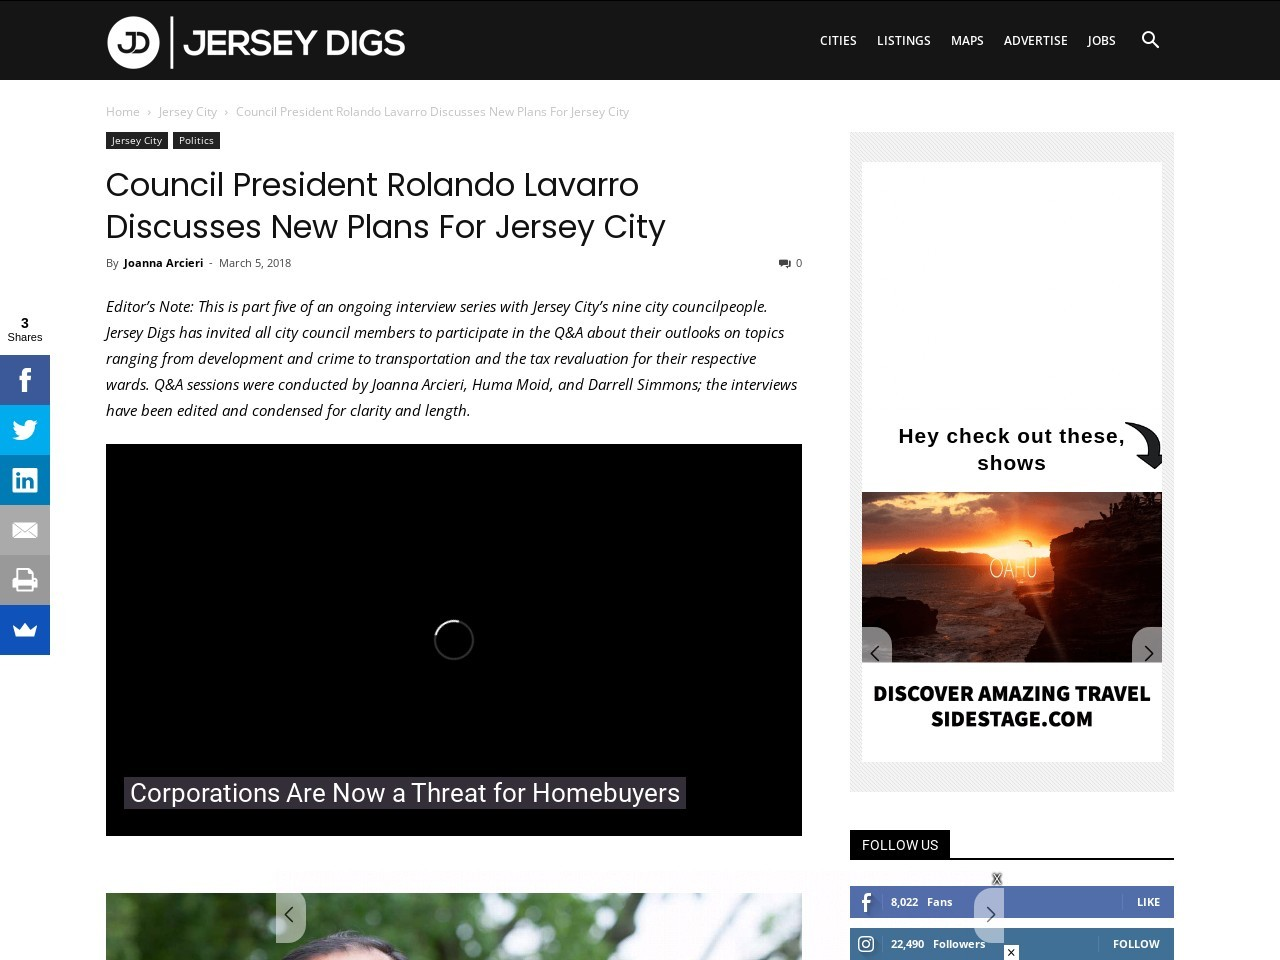 Council President Rolando Lavarro Discusses New Plans For Jersey City